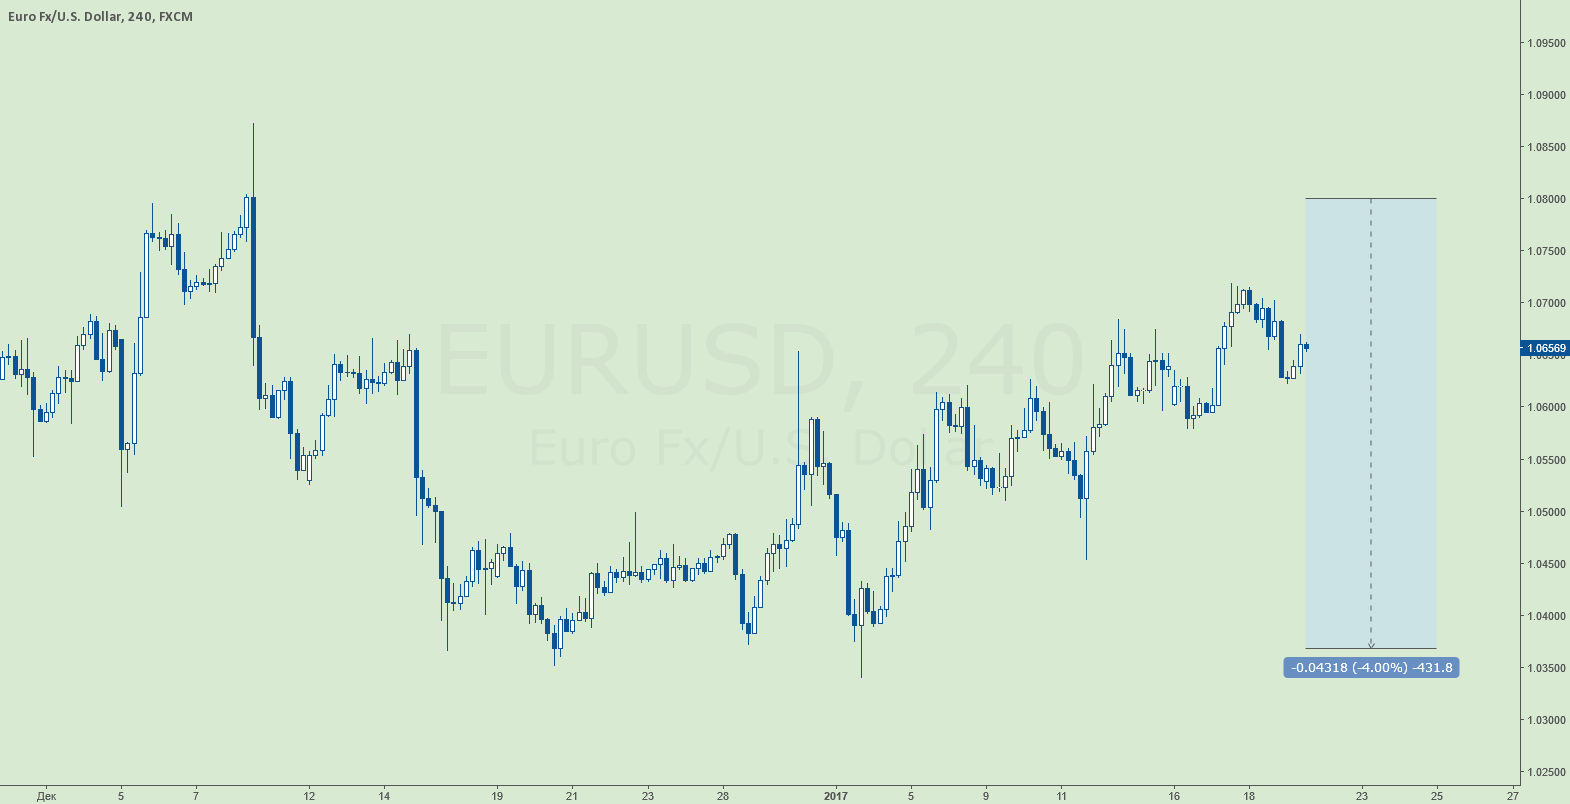 EURUSD [Sell limit]